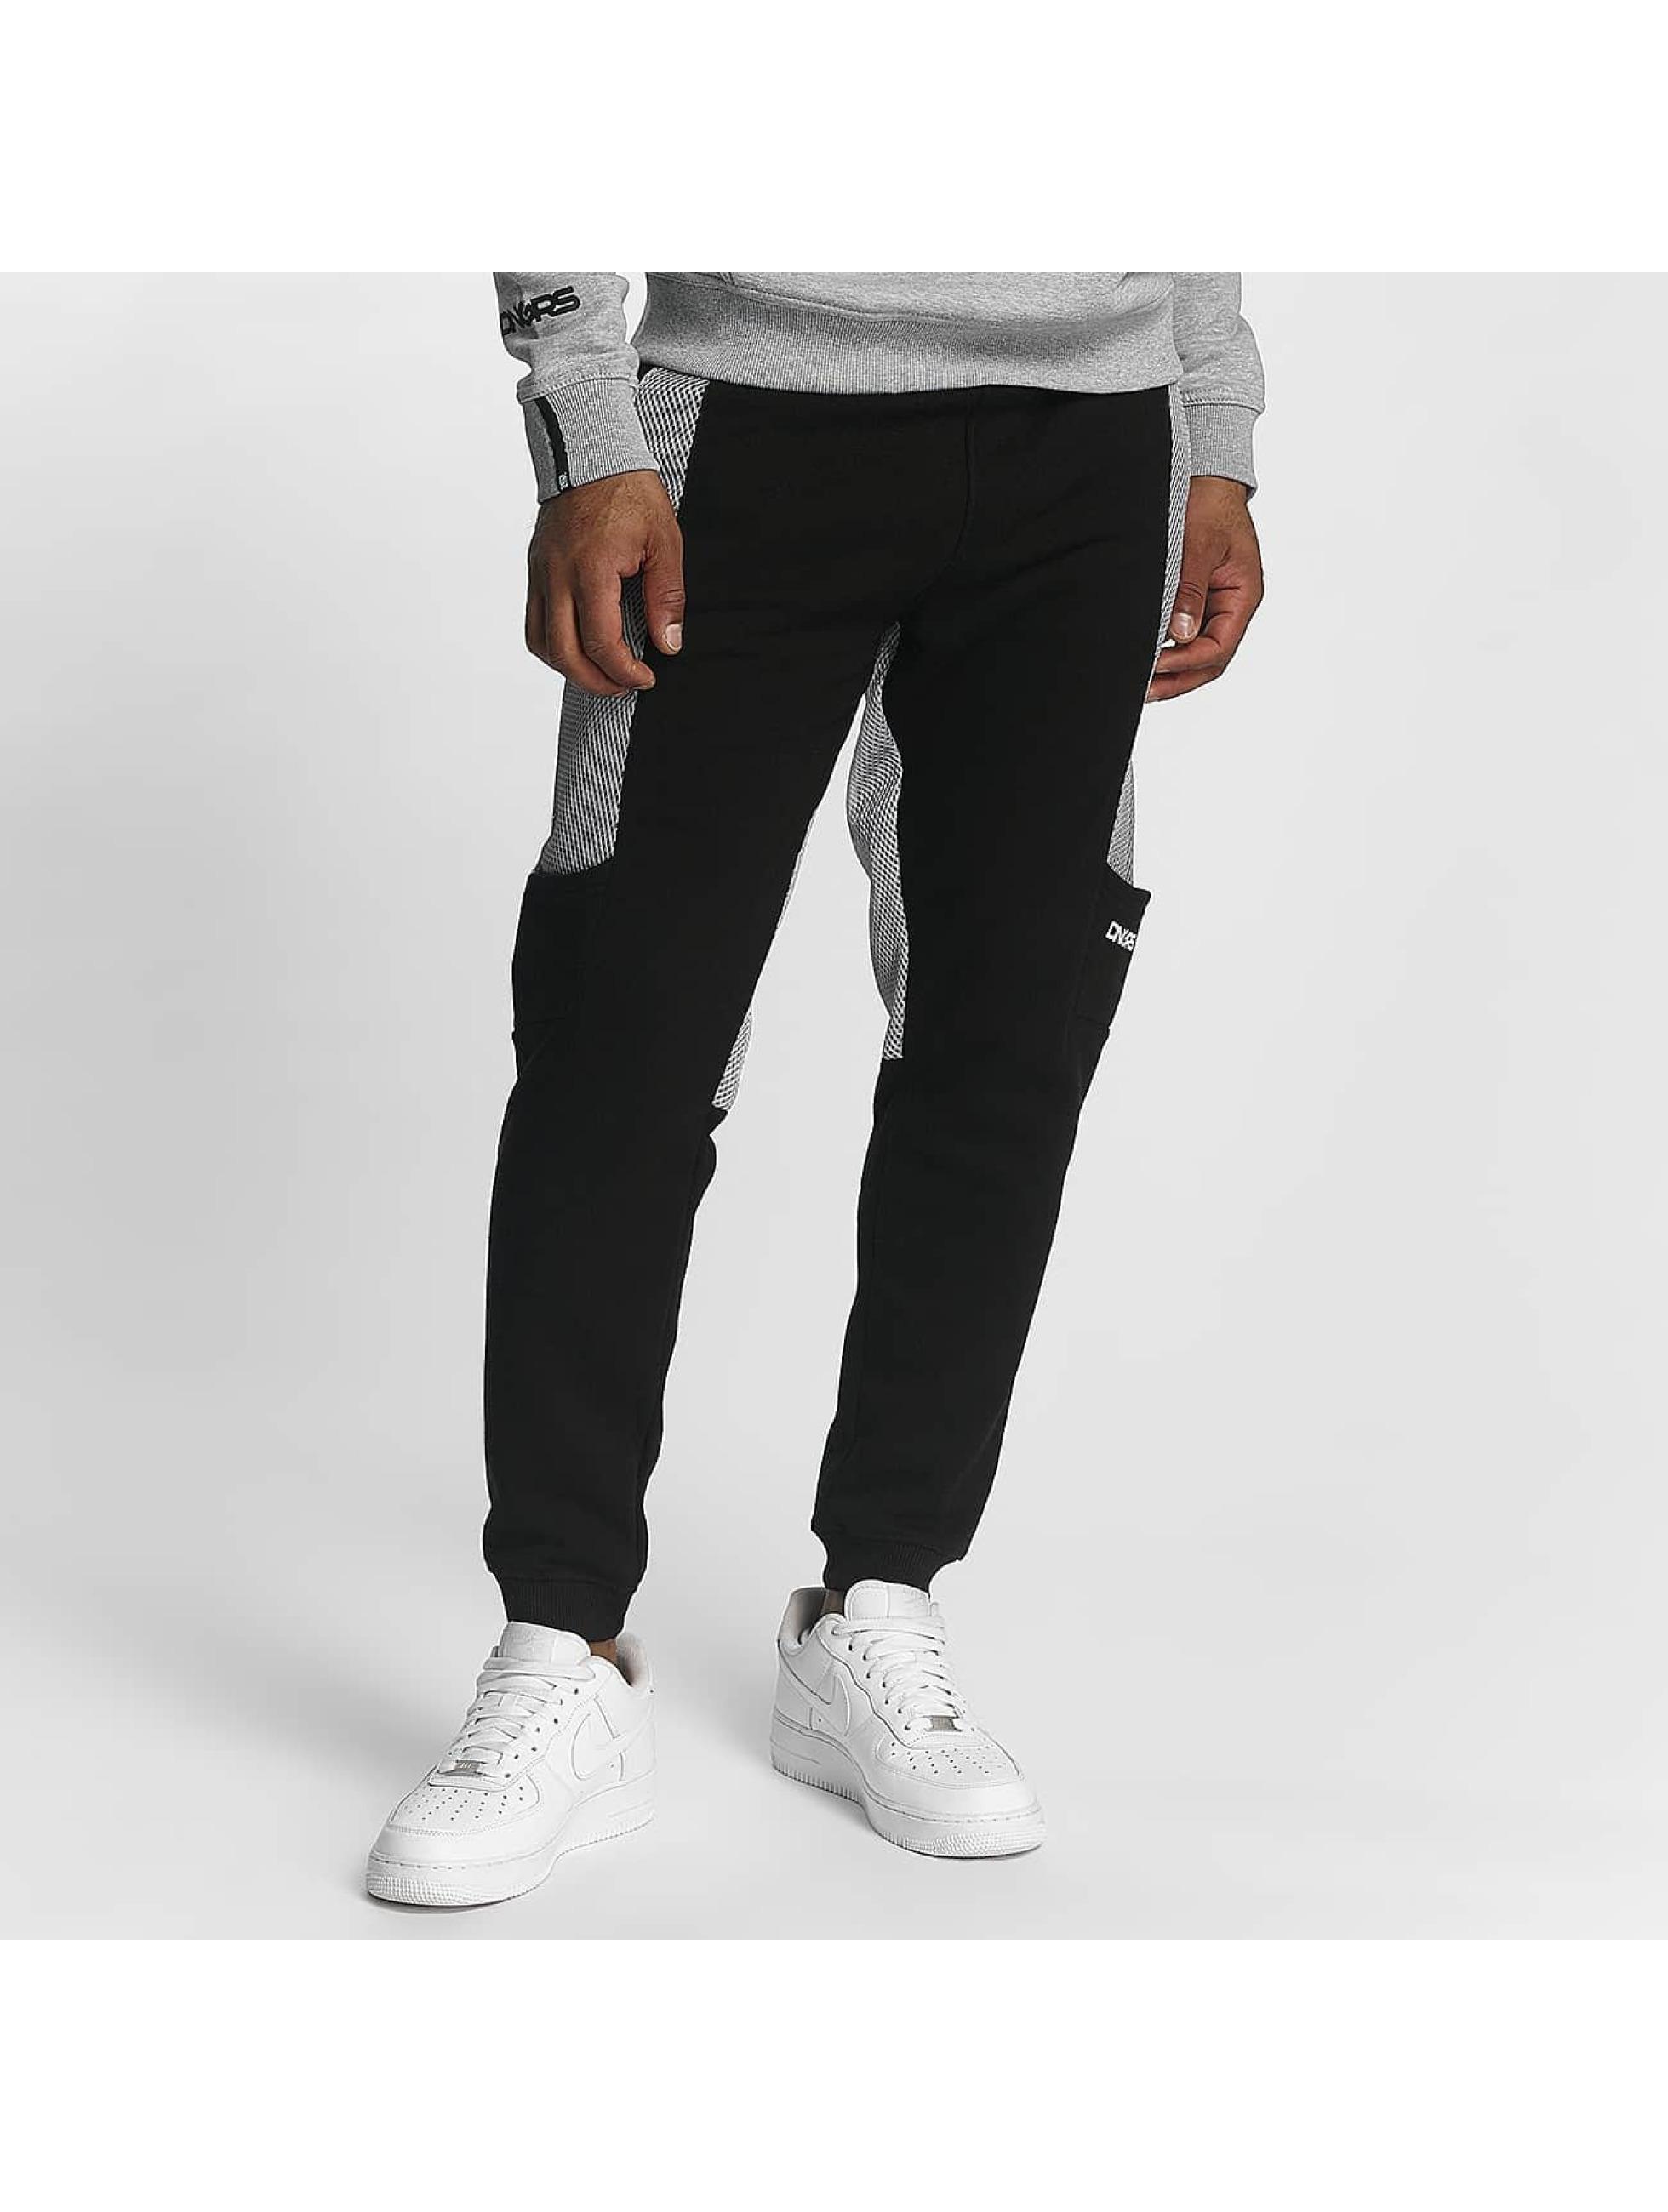 Dangerous DNGRS / Sweat Pant Pogo in grey 6XL